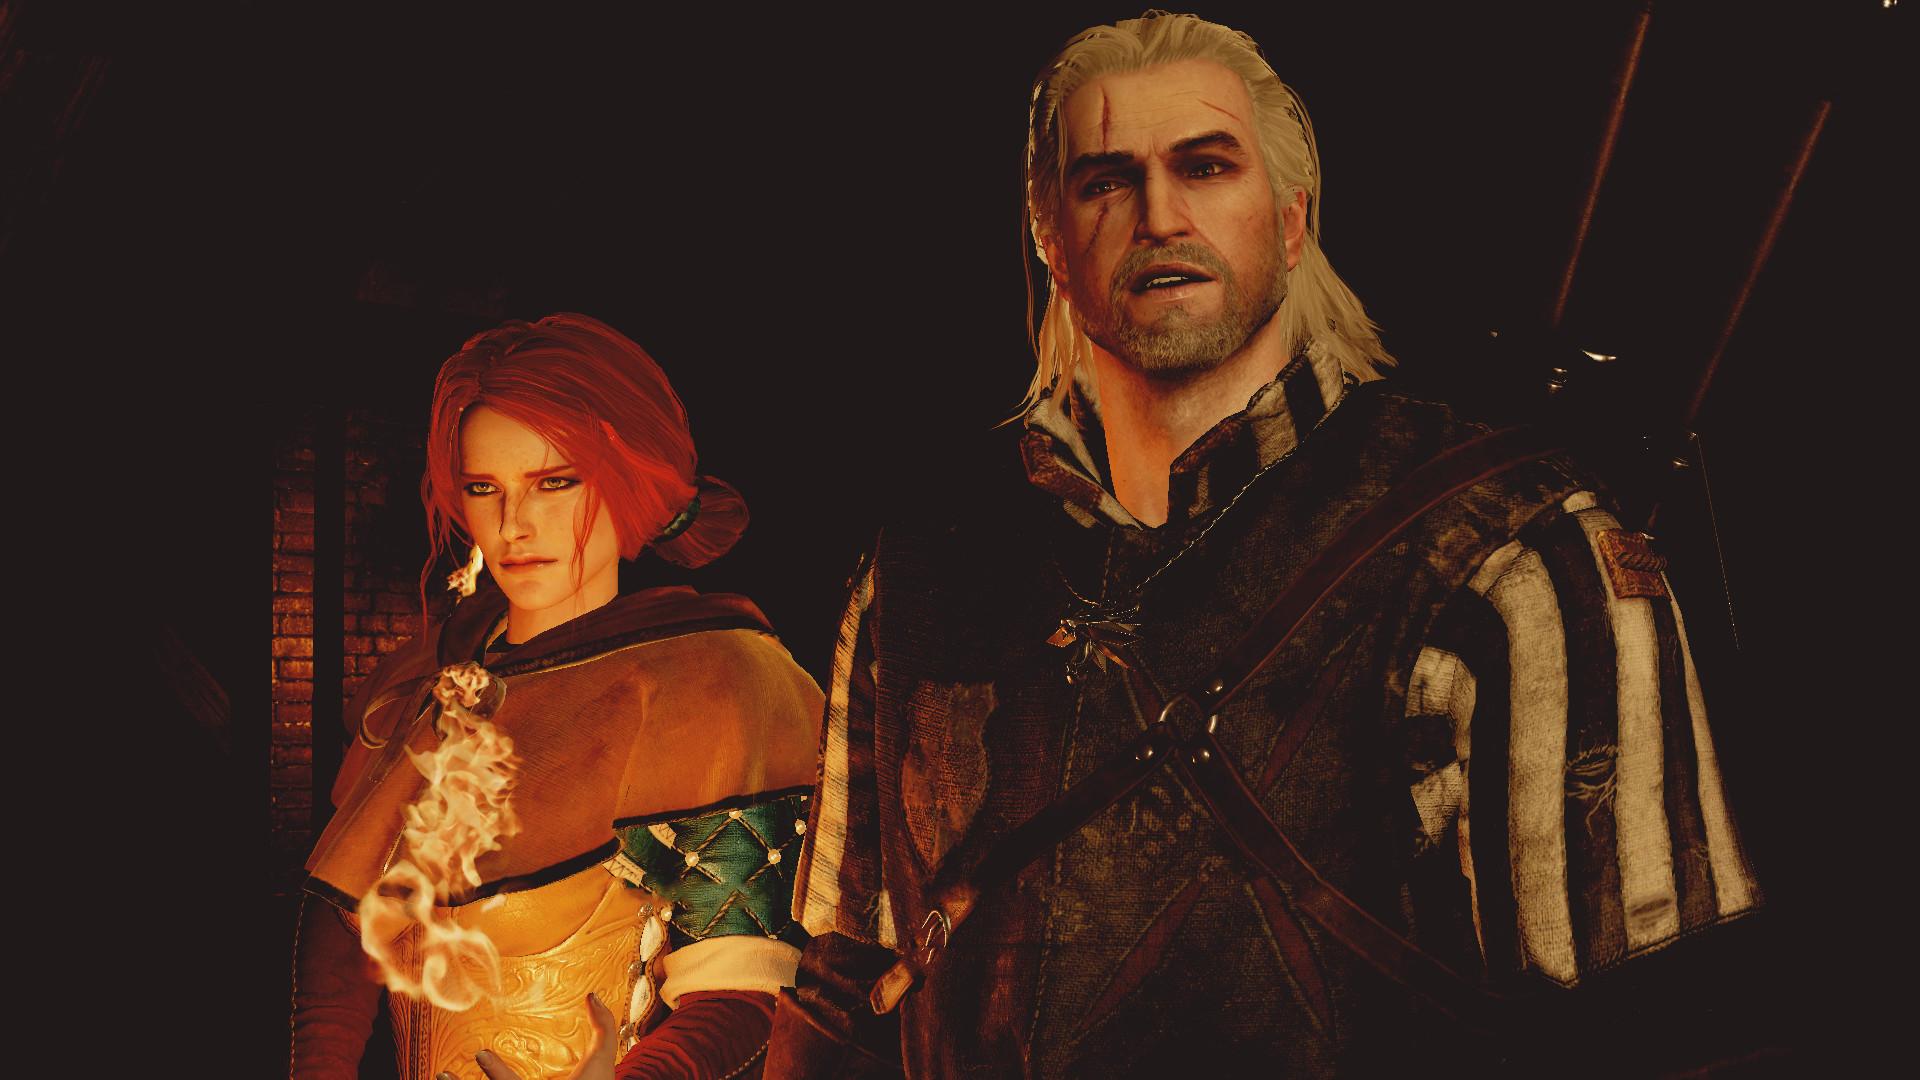 video Games, The Witcher 3: Wild Hunt, Geralt Of Rivia, Triss Merigold